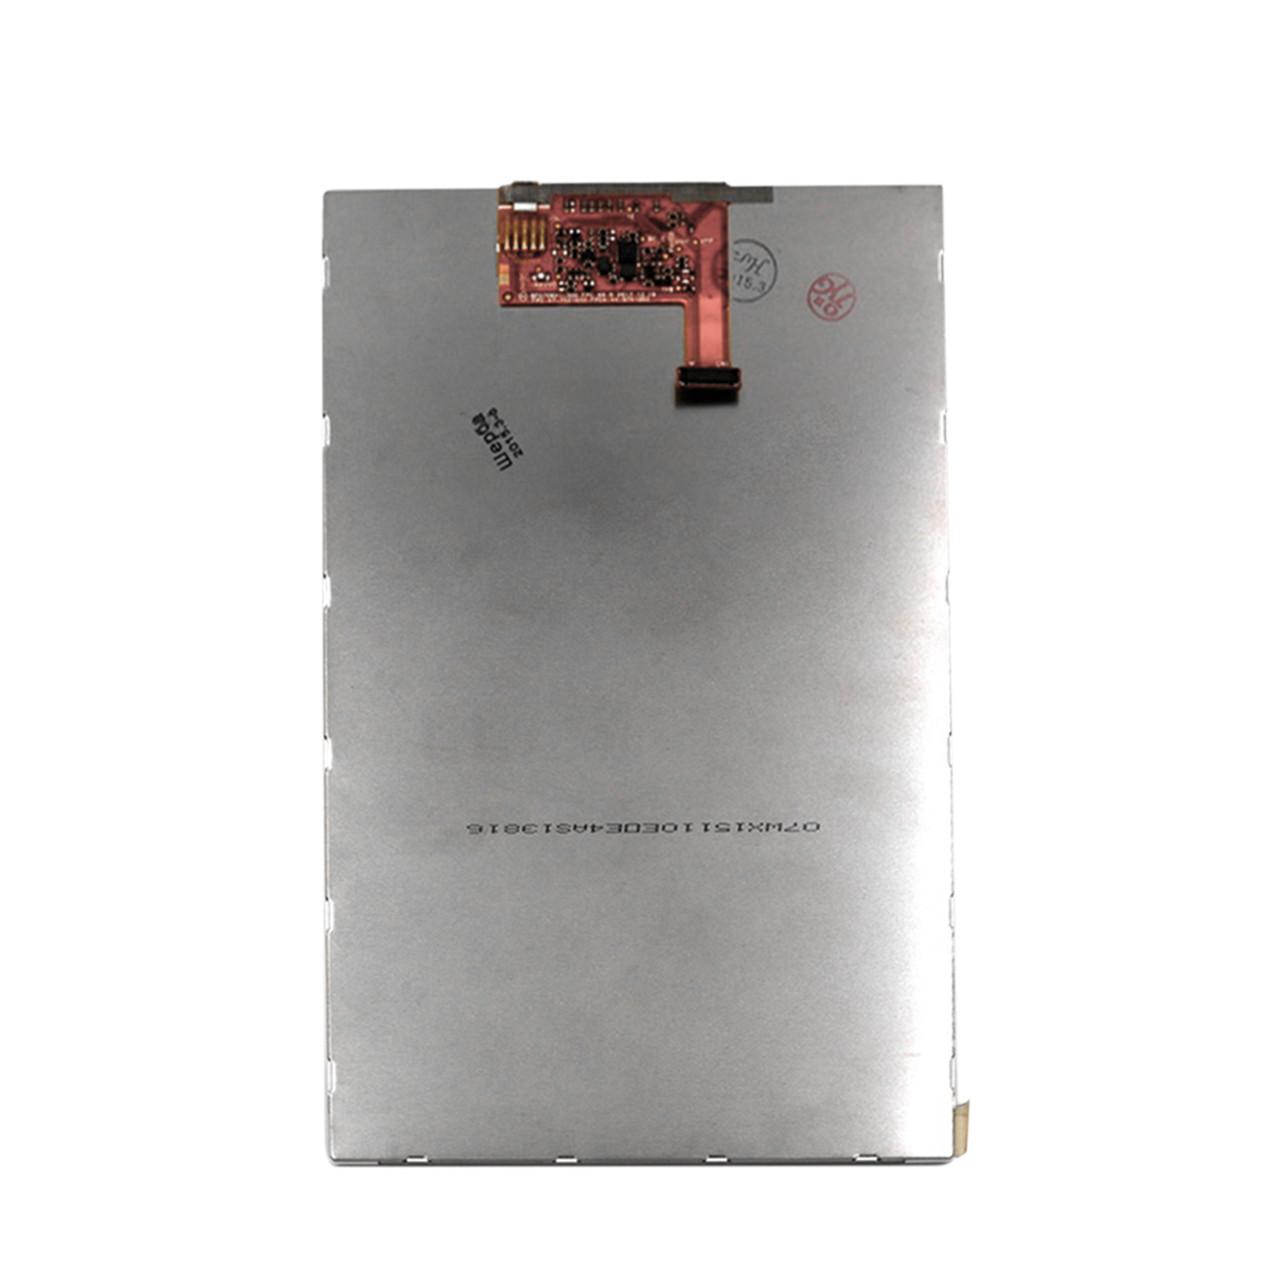 Дисплей Samsung Galaxy Tab 4 70 T230/T235 (36)